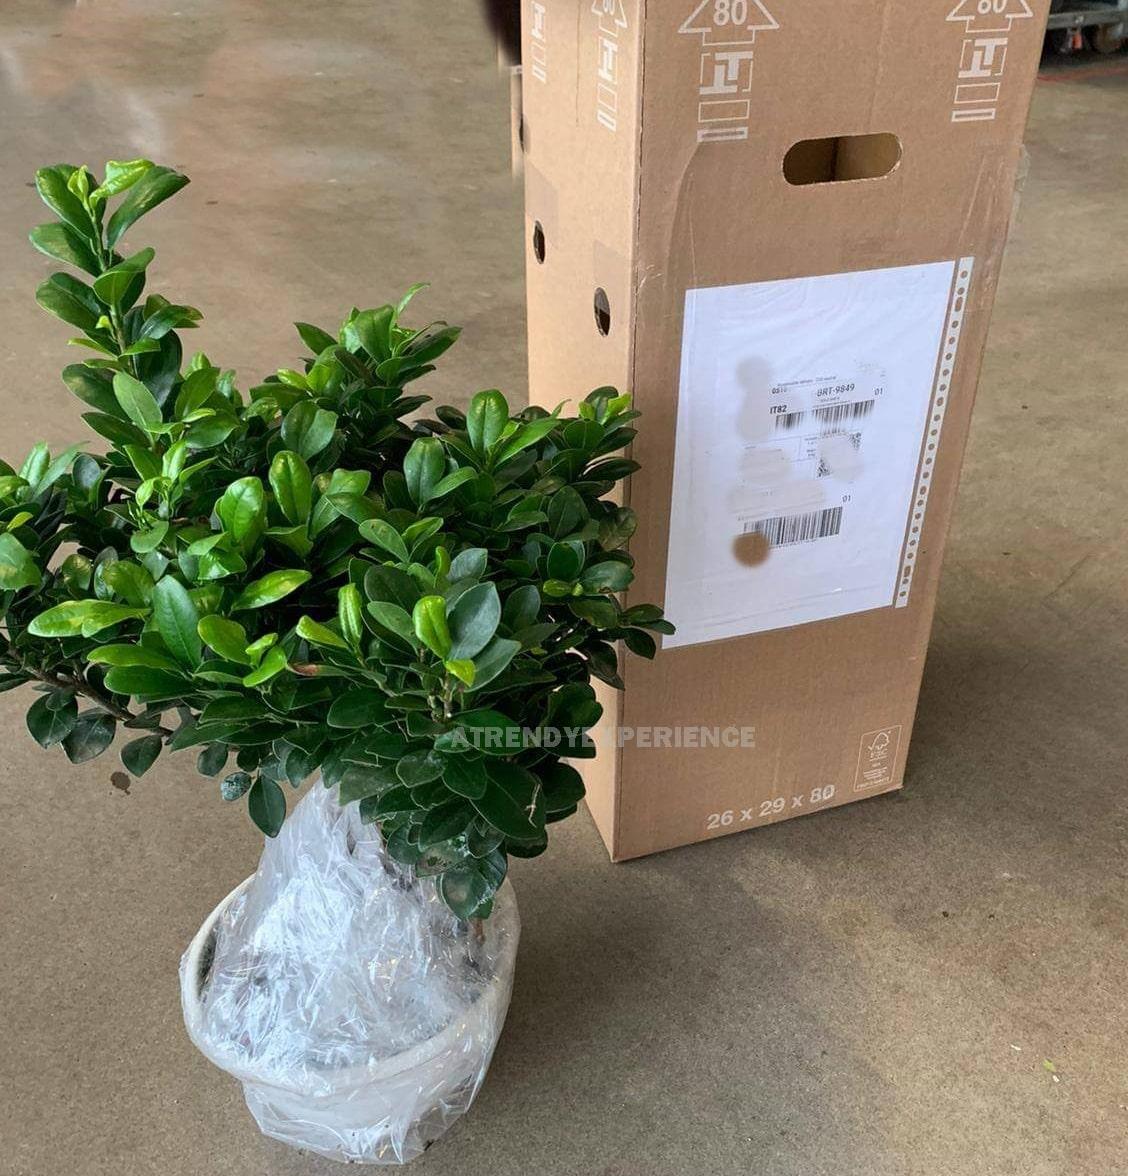 imballaggio pianta pianteclub